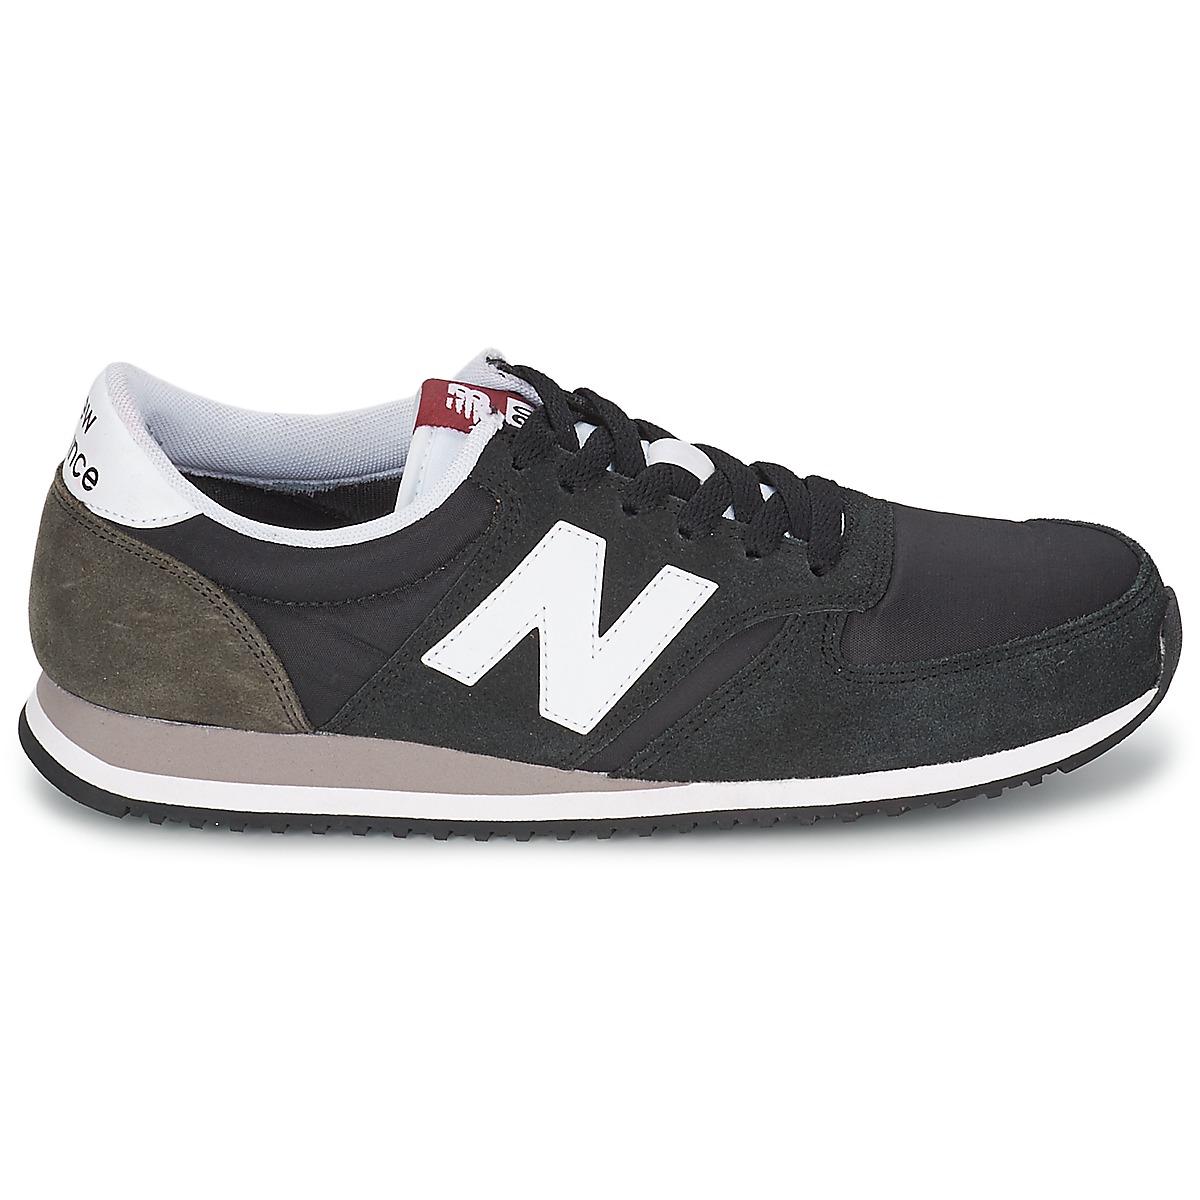 99 Low Balance Top New Black Trainersad31904521 U420 Shoes 0vNOm8nw